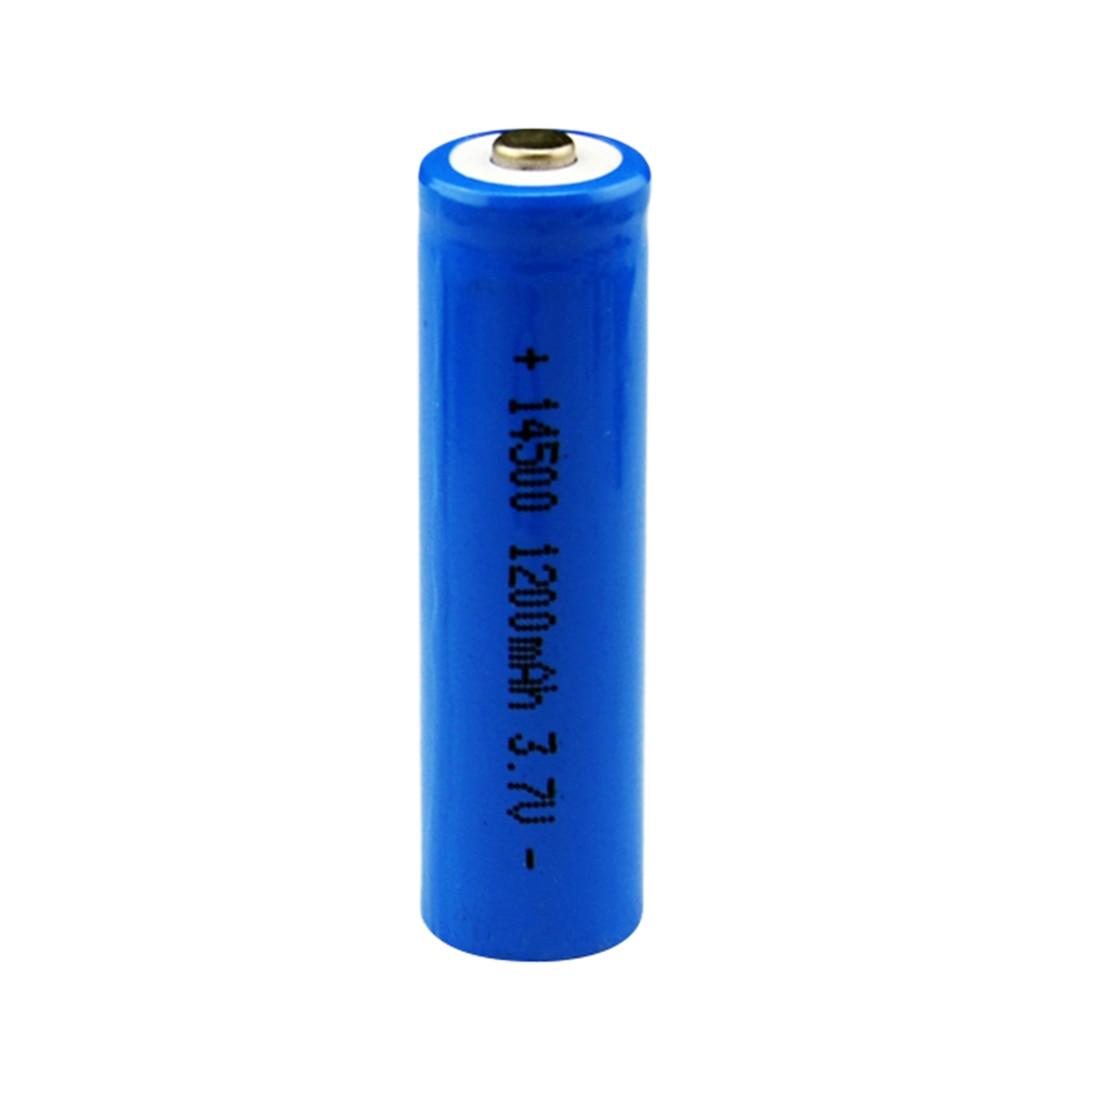 Pro 1 pcs/set High Capacitance 14500 Battery 3.7V 1300mAh Rechargeable li-ion Battery for Led Flashlight Batery Battery Newest 1300mah li ion battery